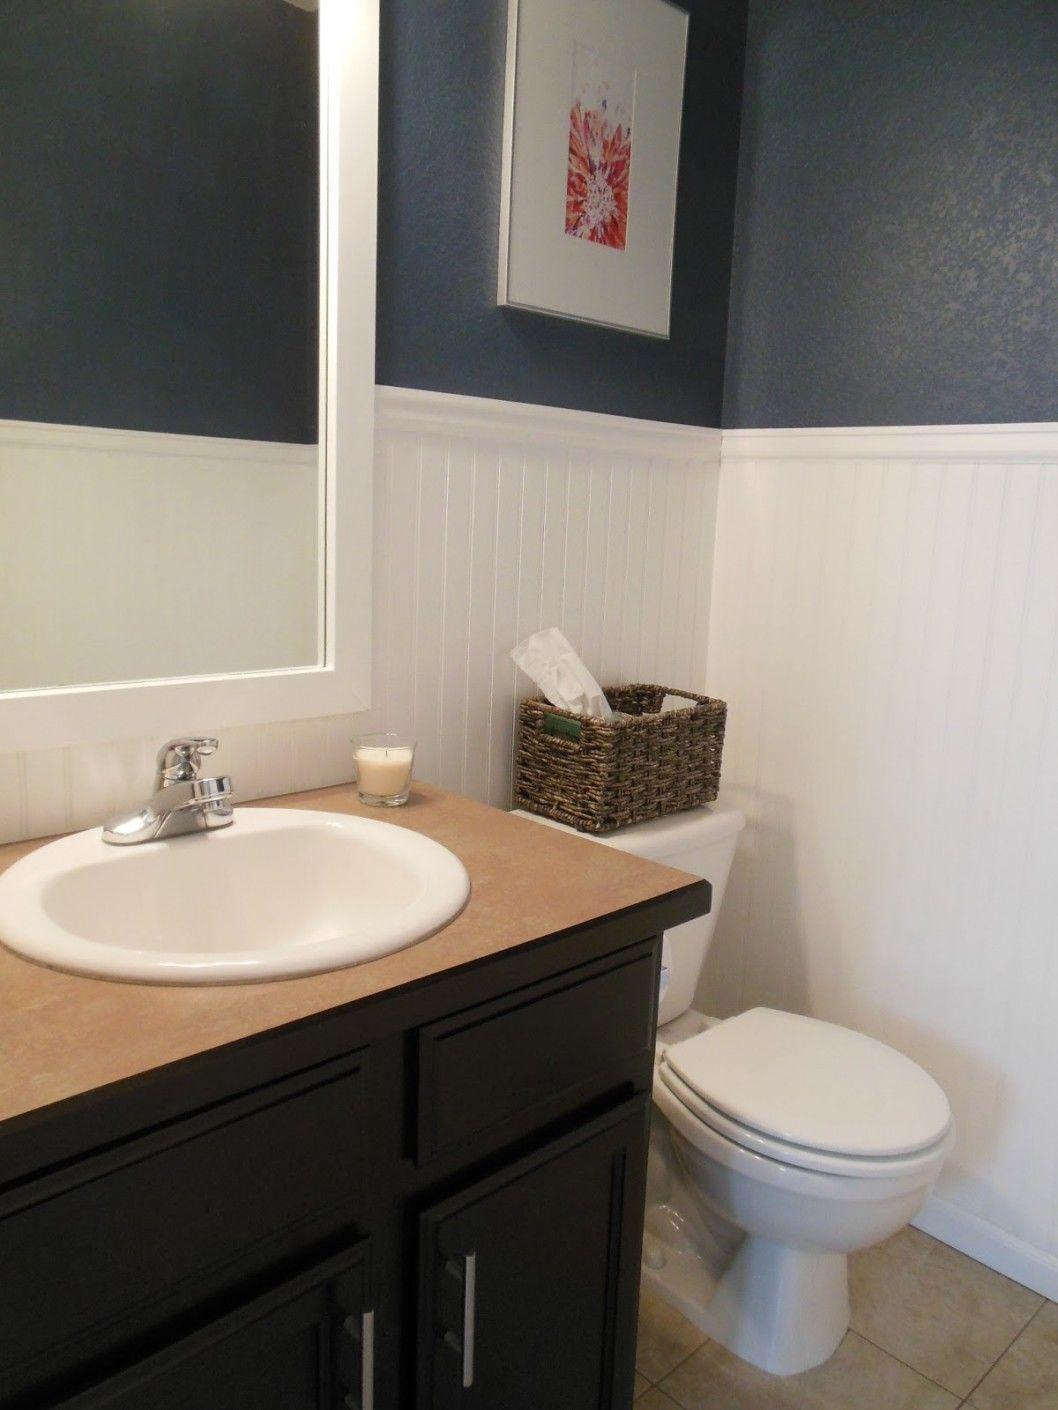 cute wall tiles for bathroom ideas-Fantastic Wall Tiles for Bathroom Decoration